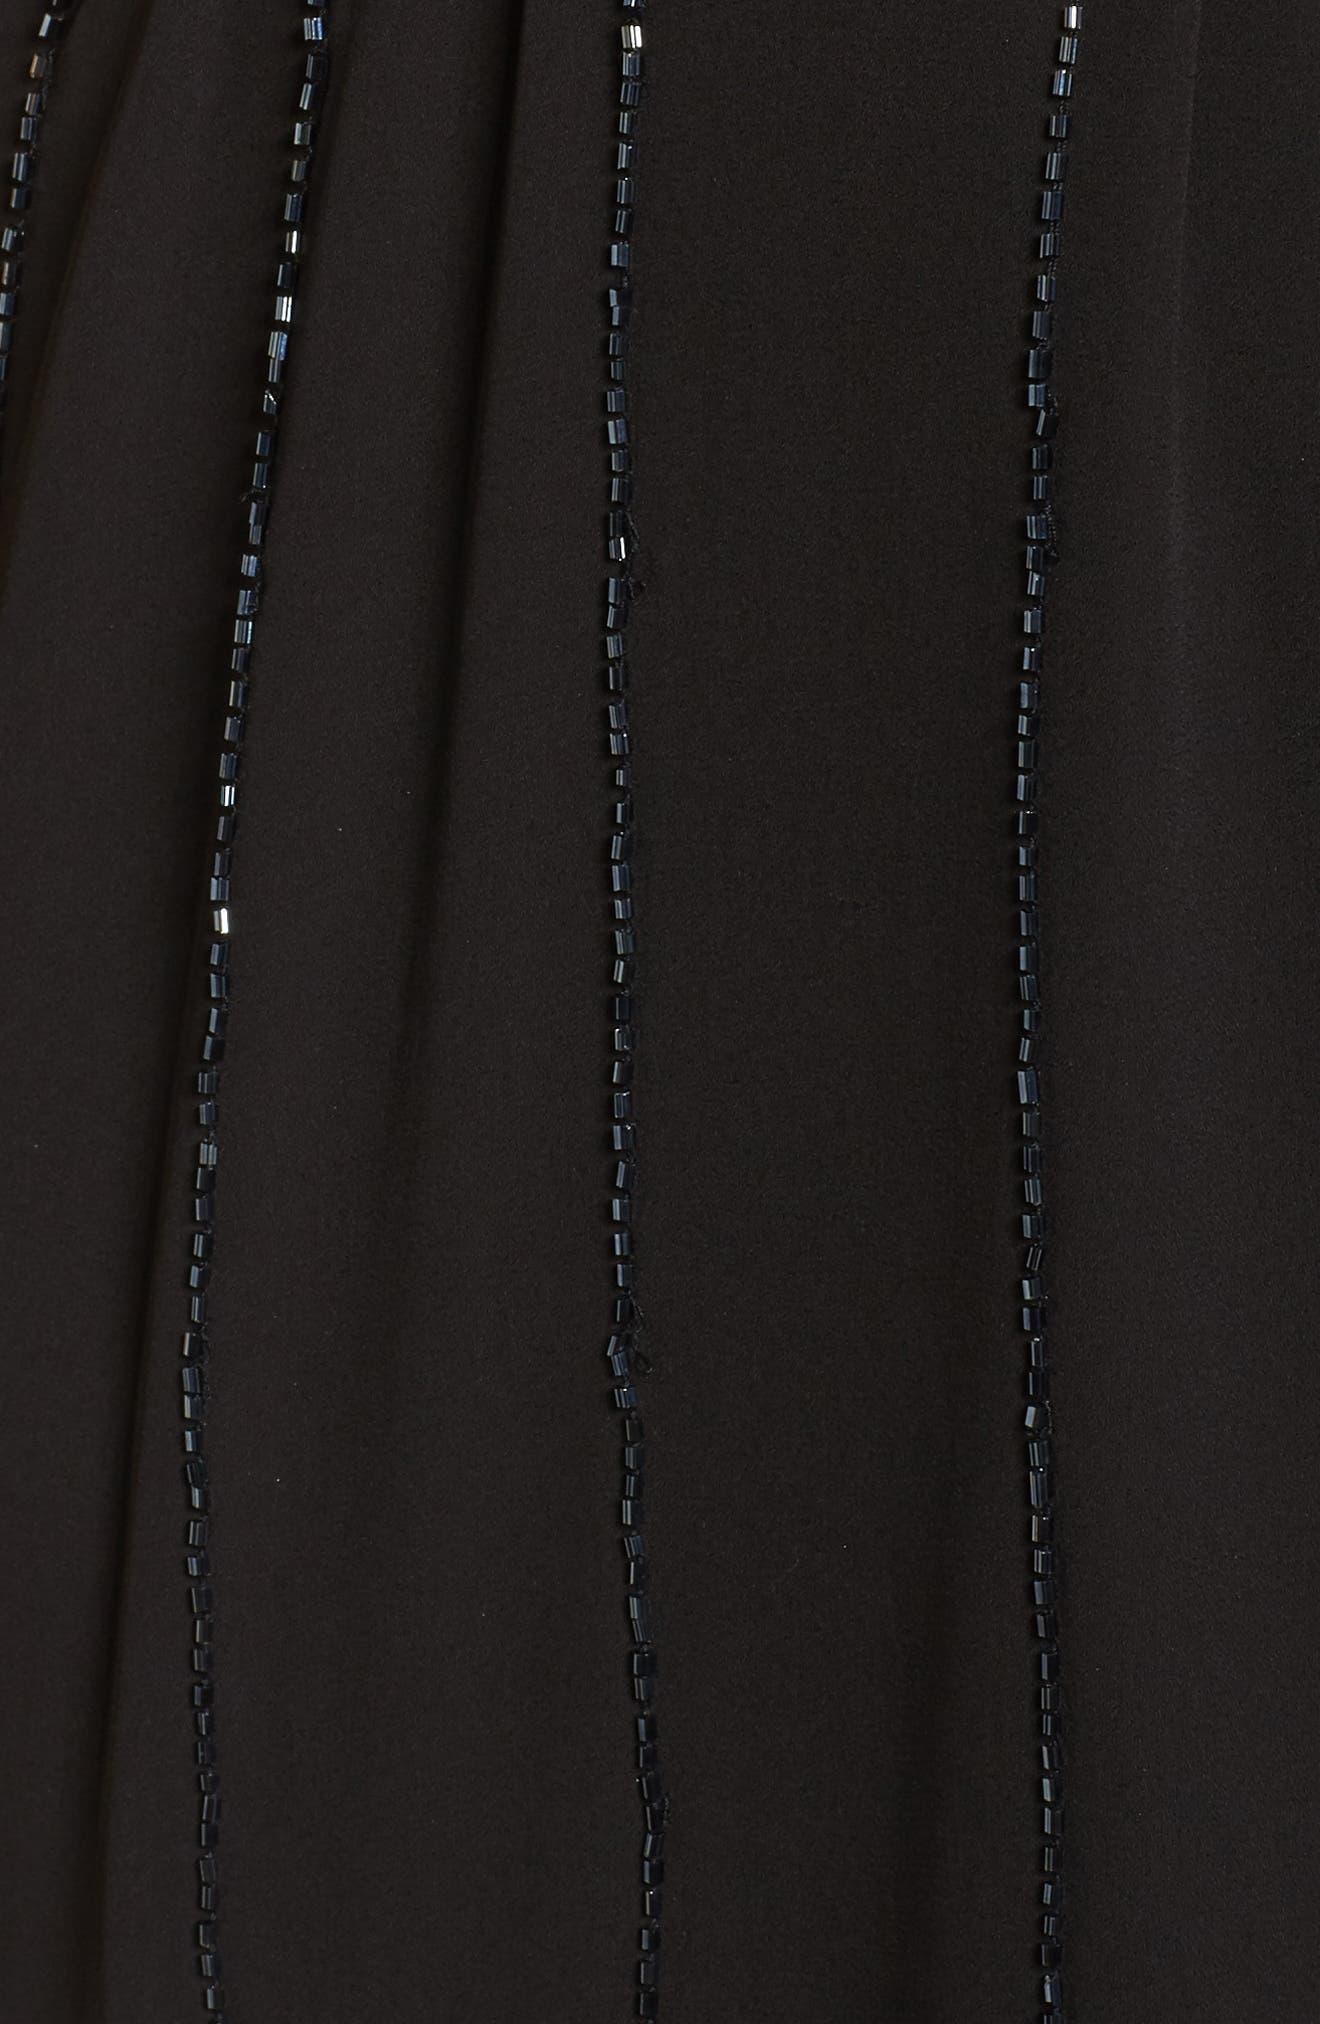 Beaded A-Line Dress,                             Alternate thumbnail 5, color,                             001